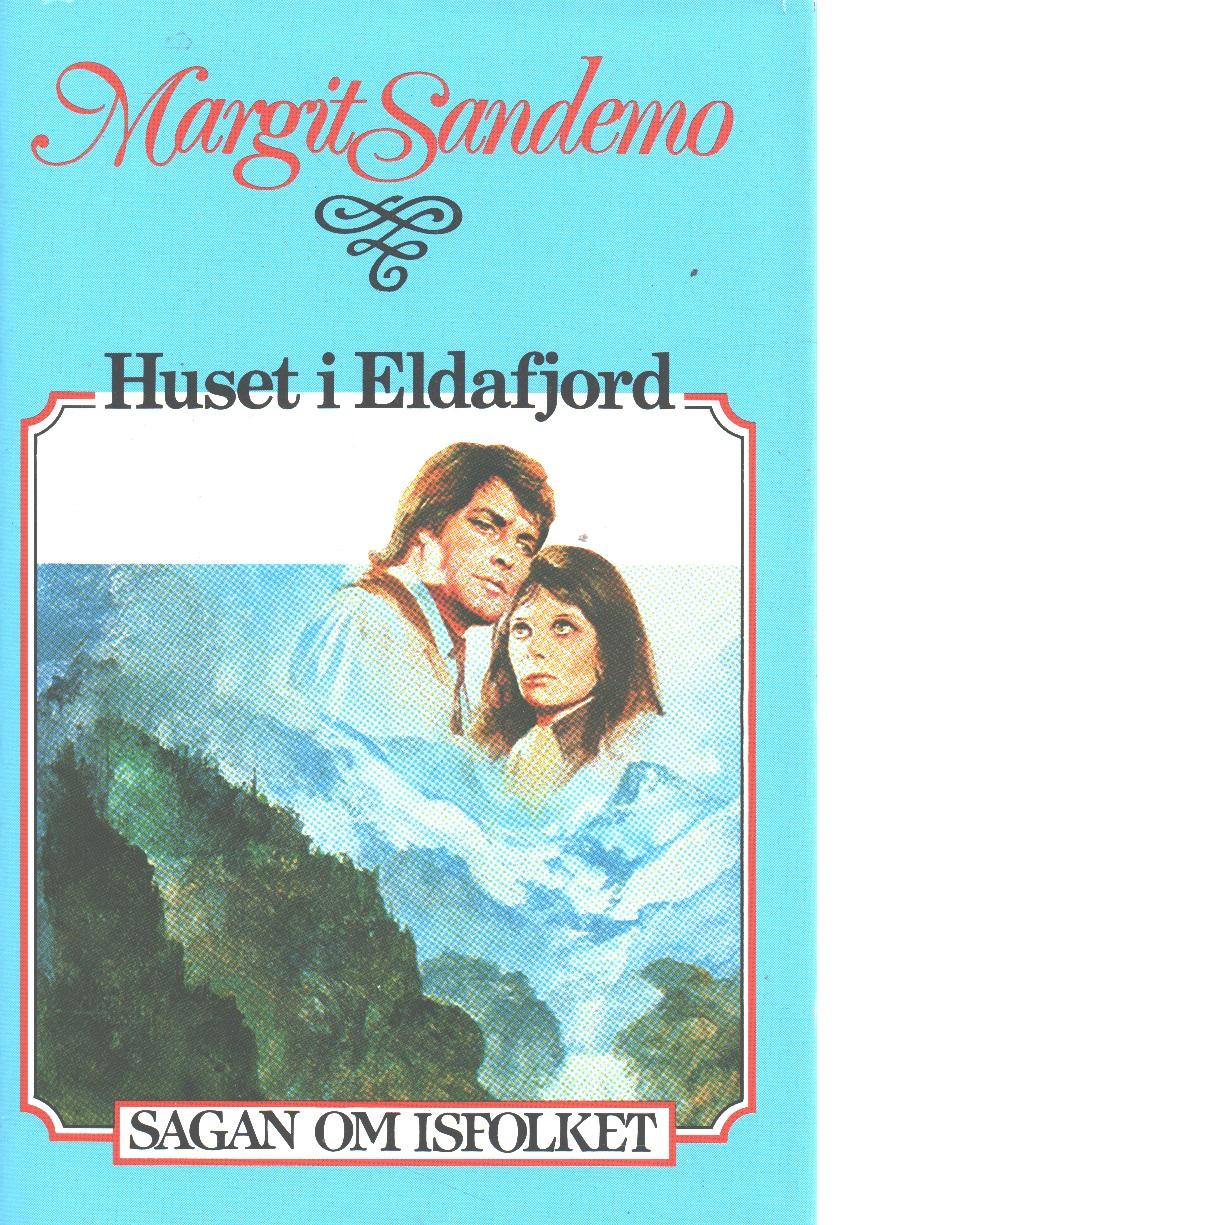 Huset i Eldafjord : Sagan om Isfolket nr. 26 - Sandemo, Margit